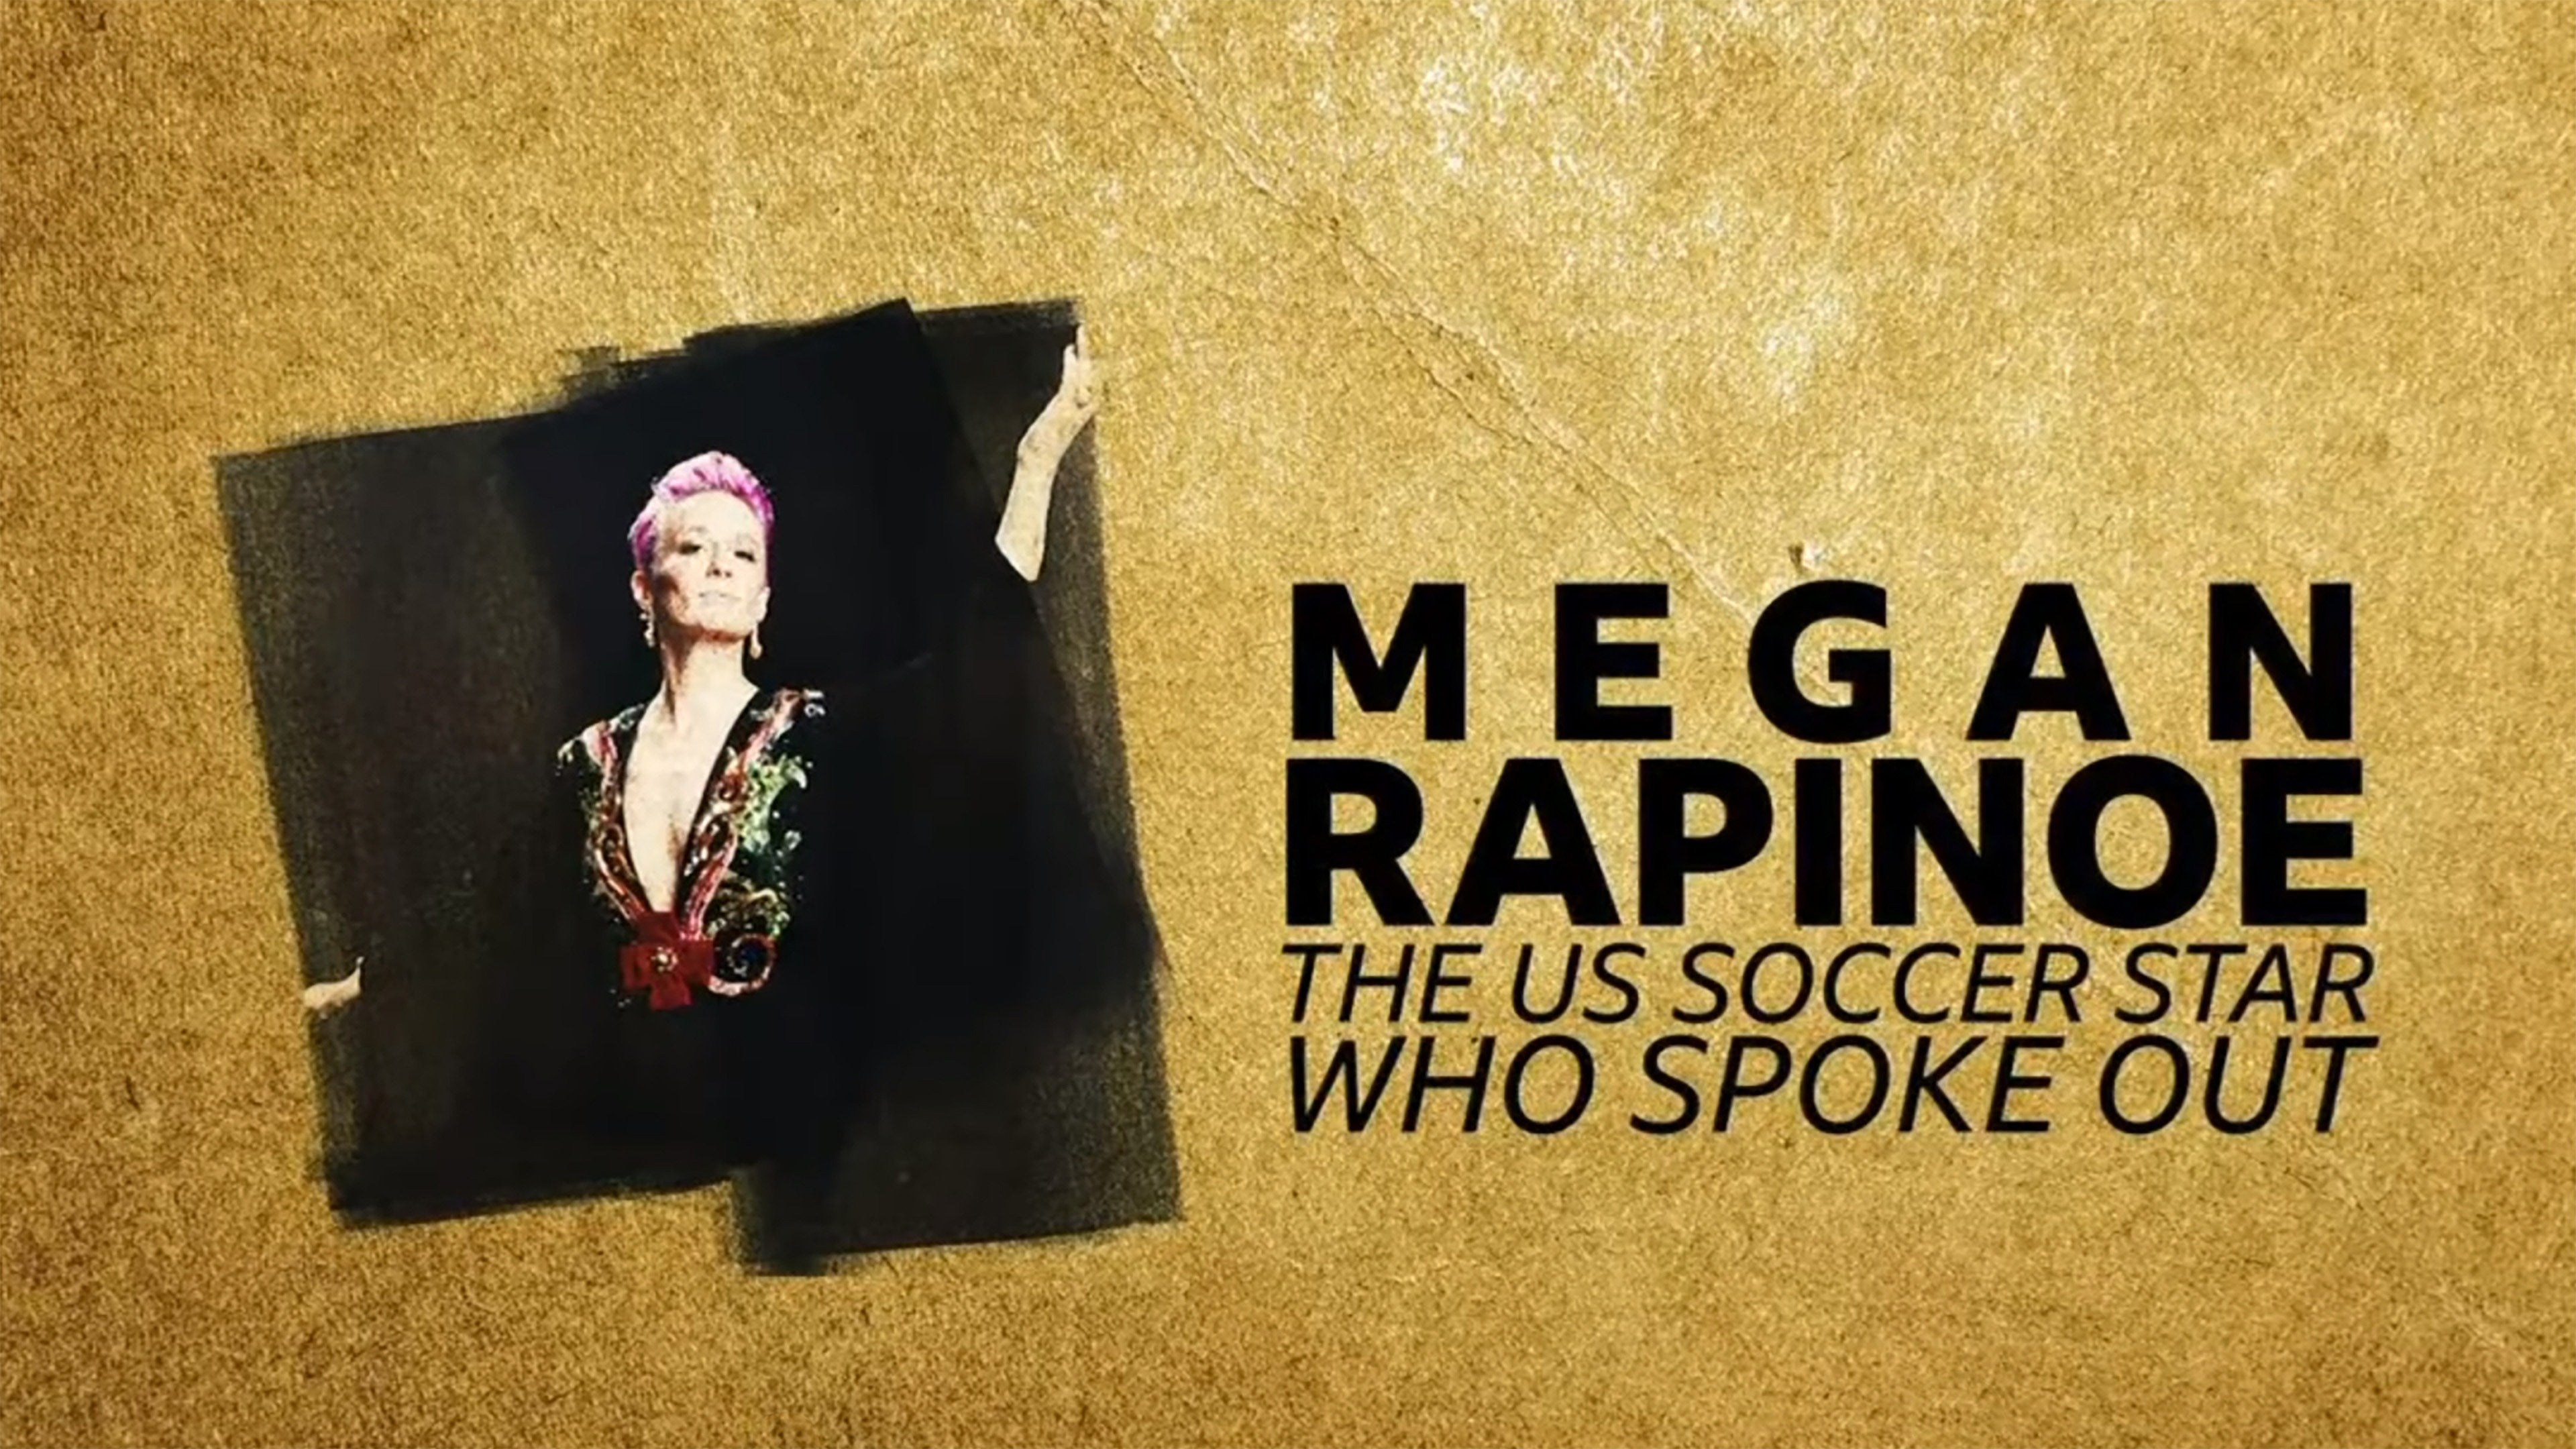 Megan Rapinoe: The US Soccer Star Who Spoke Out